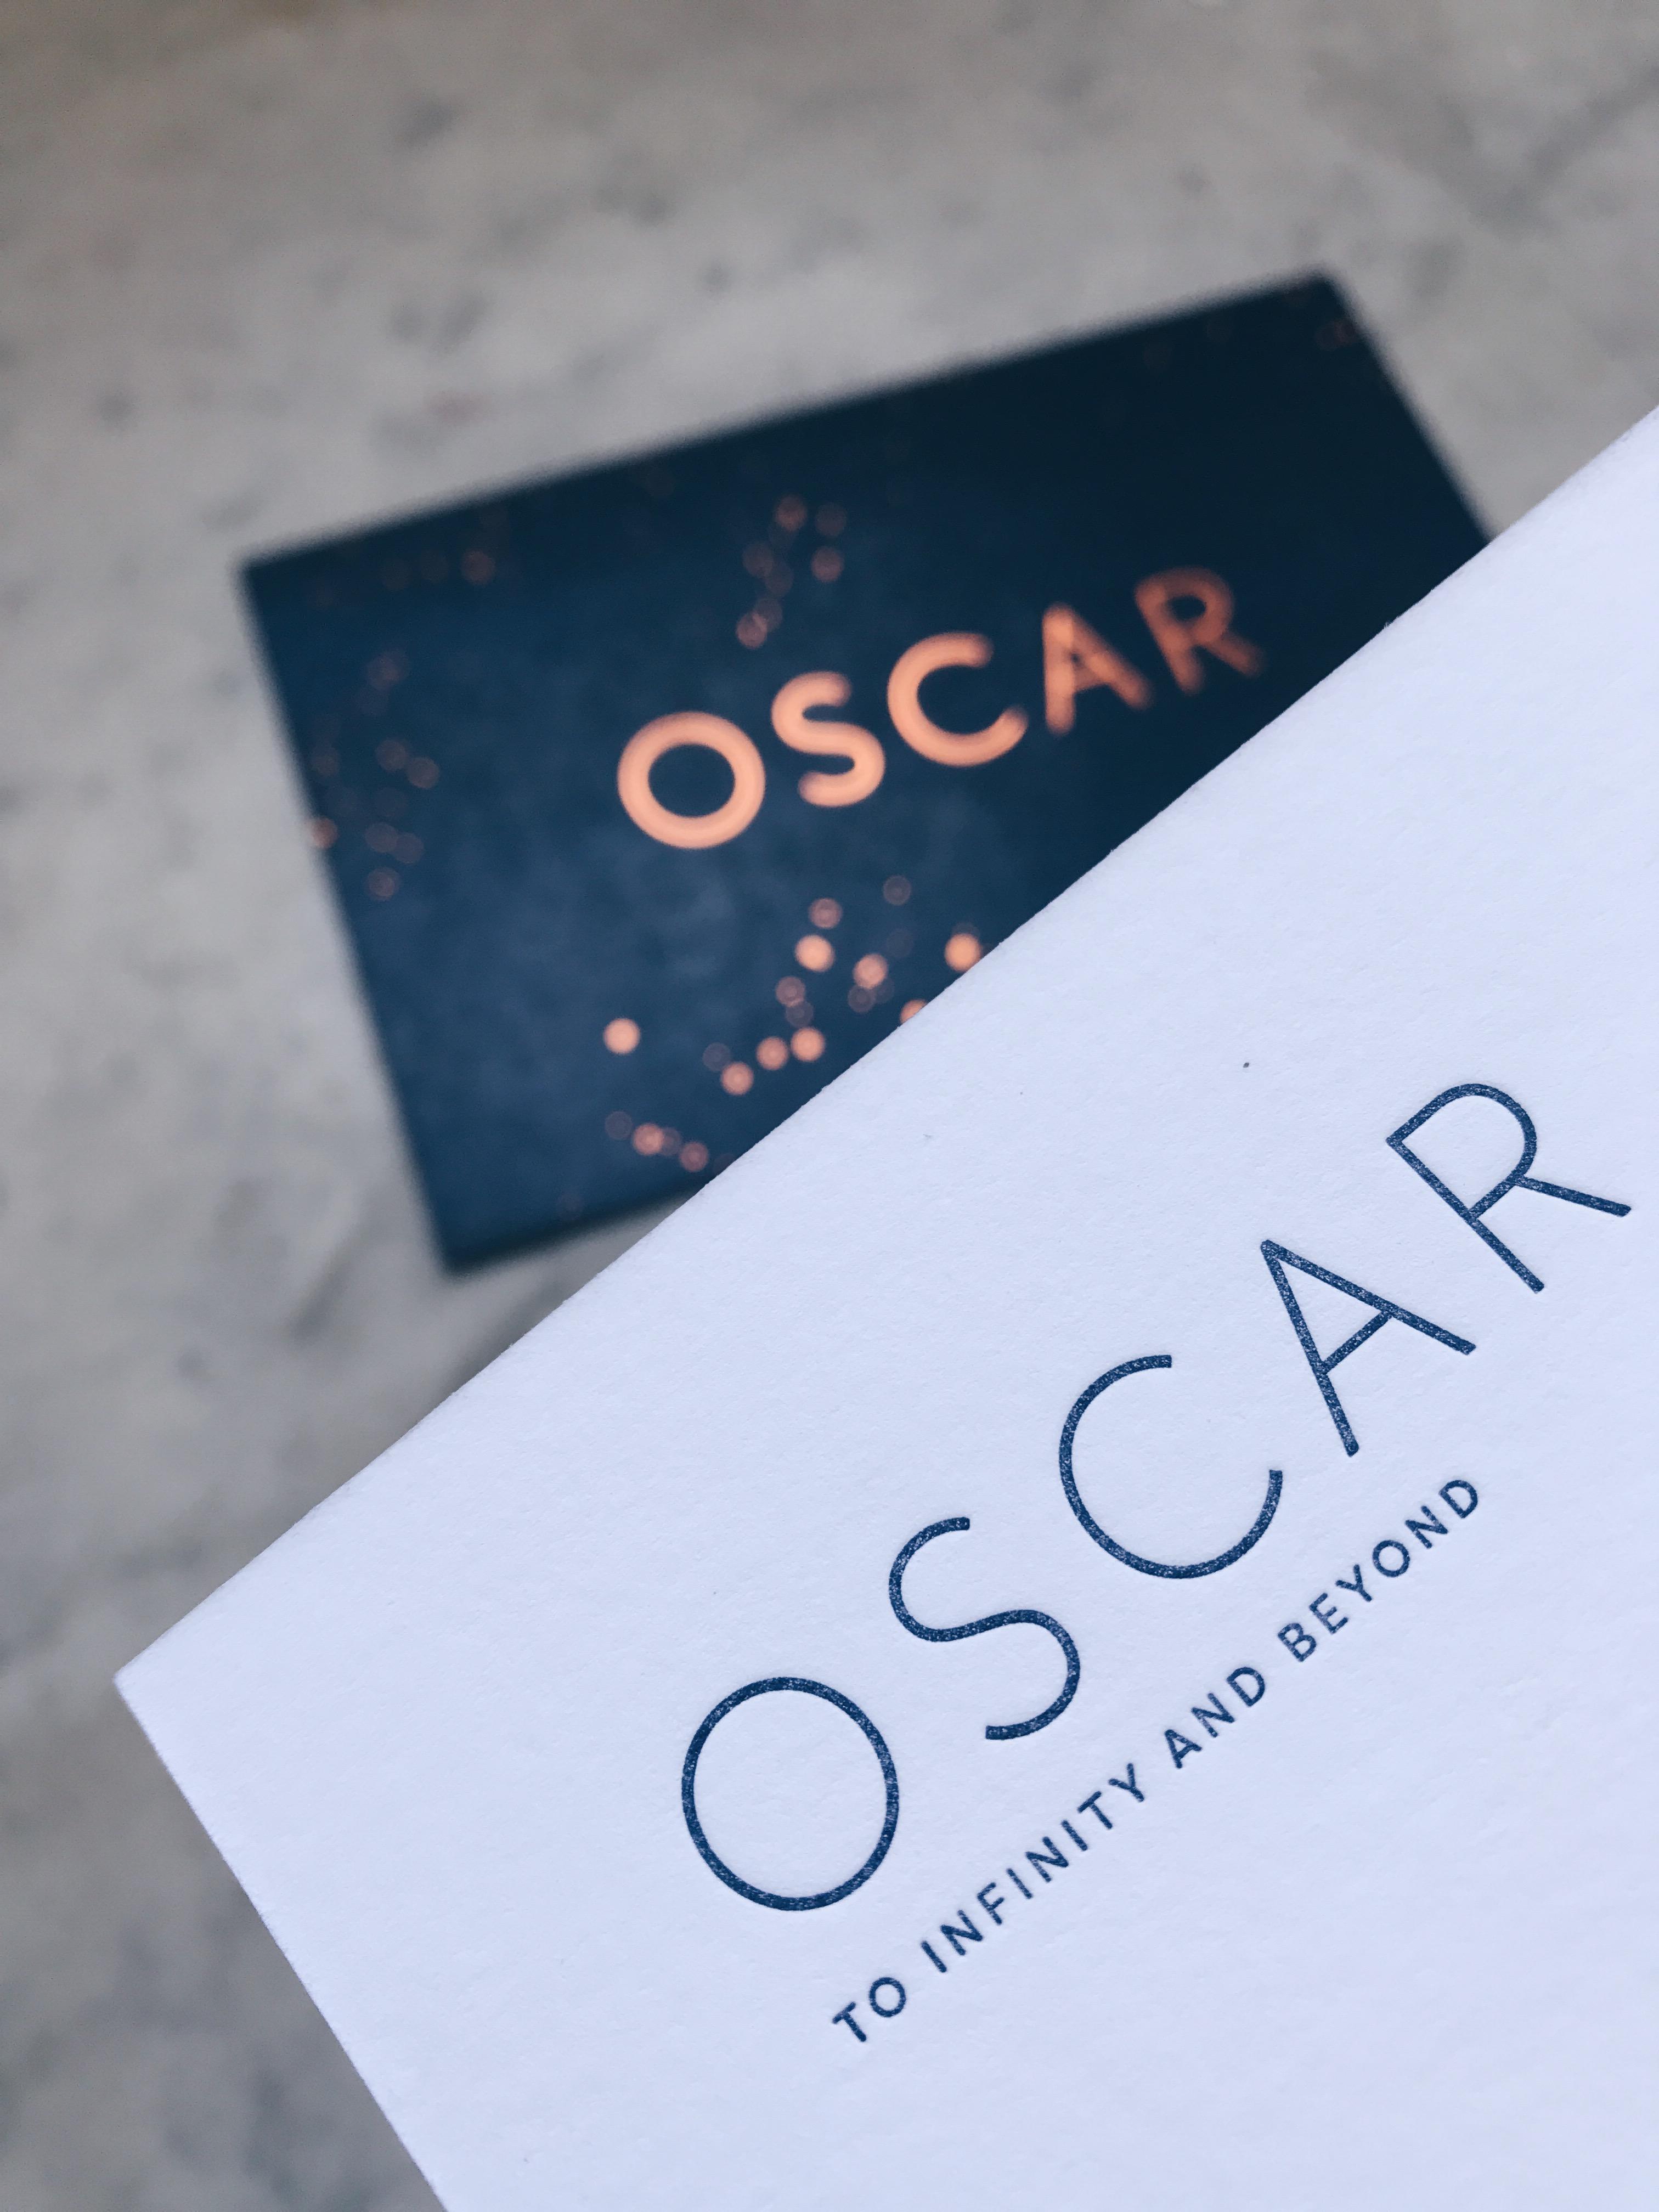 Geboortekaartje Letterpress koperfolie, Oscar, sterren, blauwe achtergrond, minimalistisch